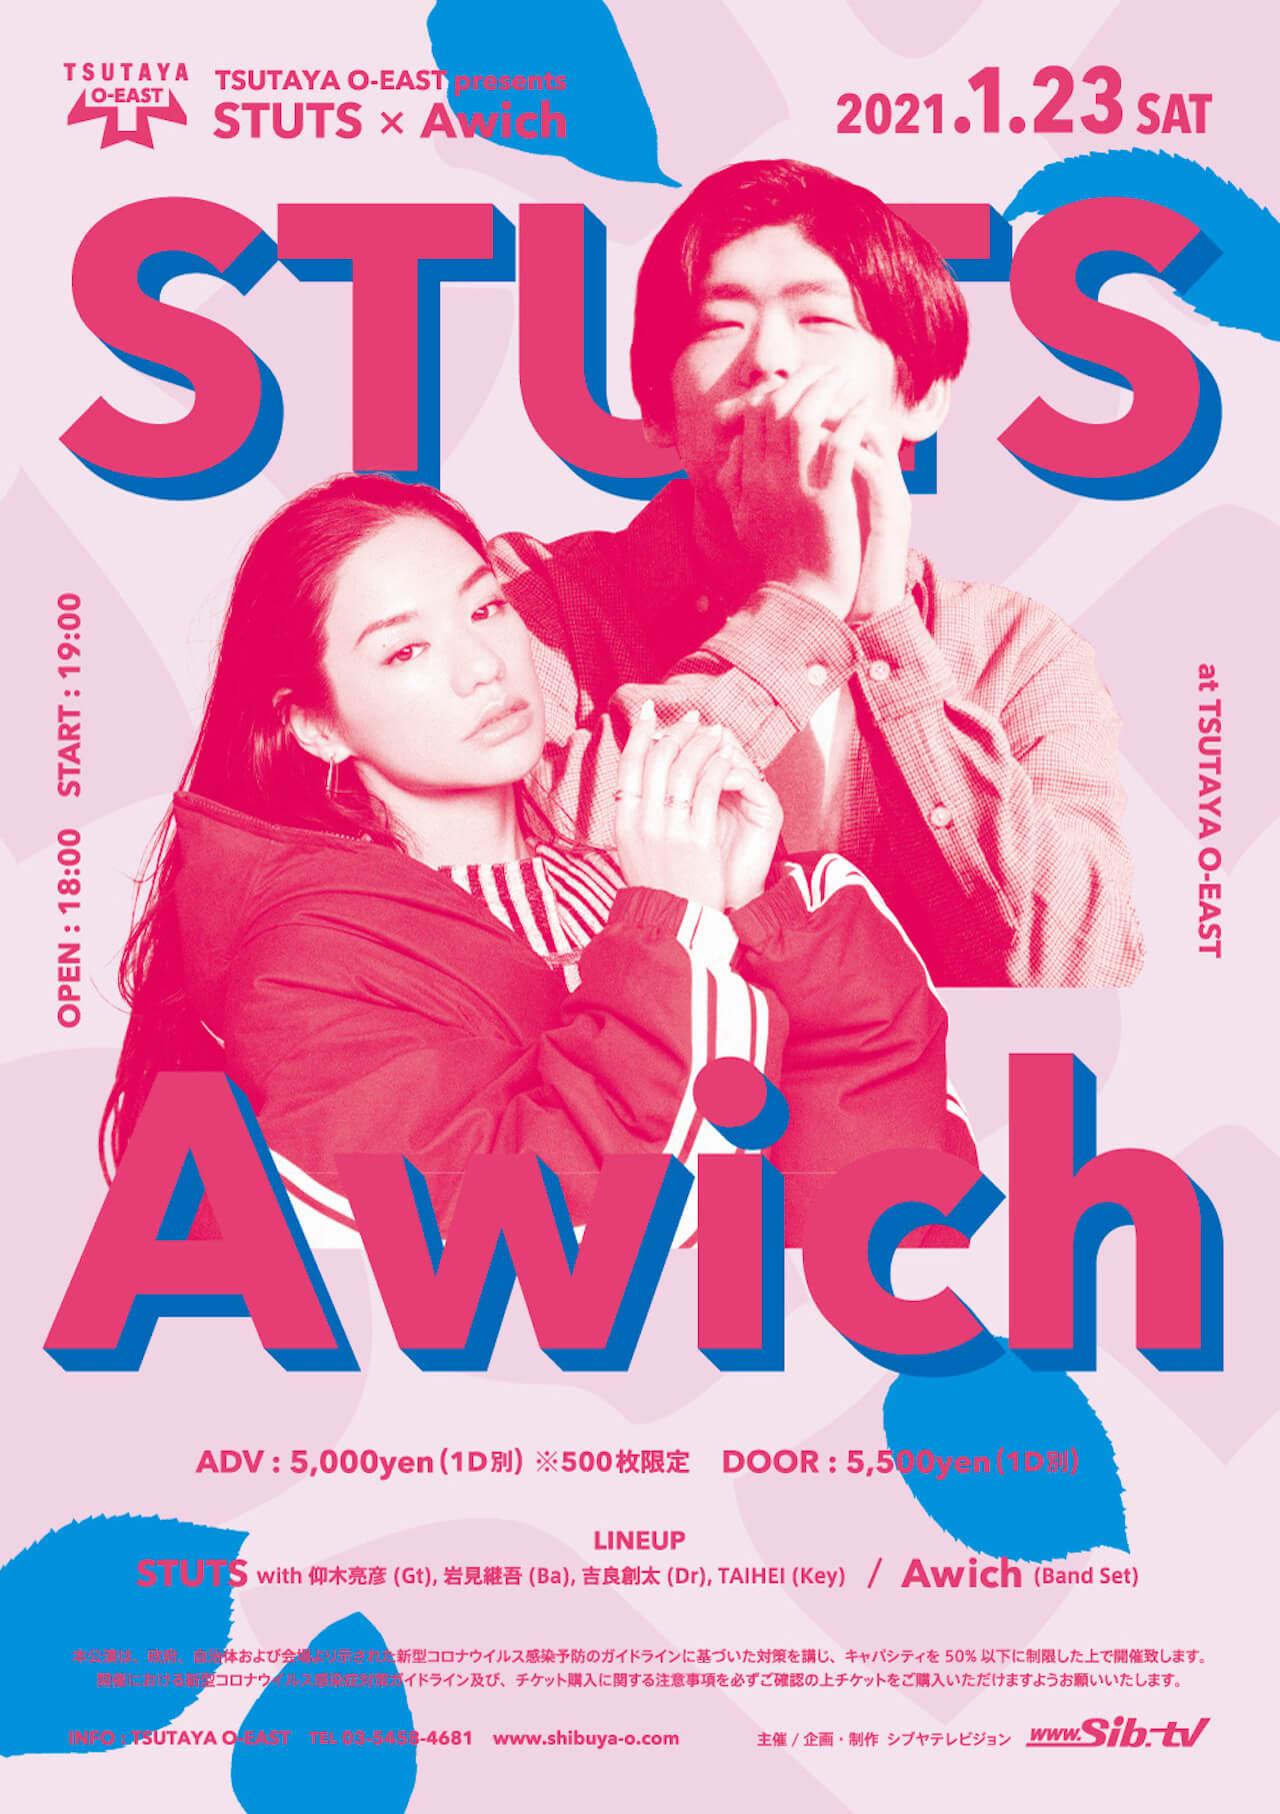 STUTS × Awich、バンドセットでの2マンライブの開催決定 music201225-stus-awich